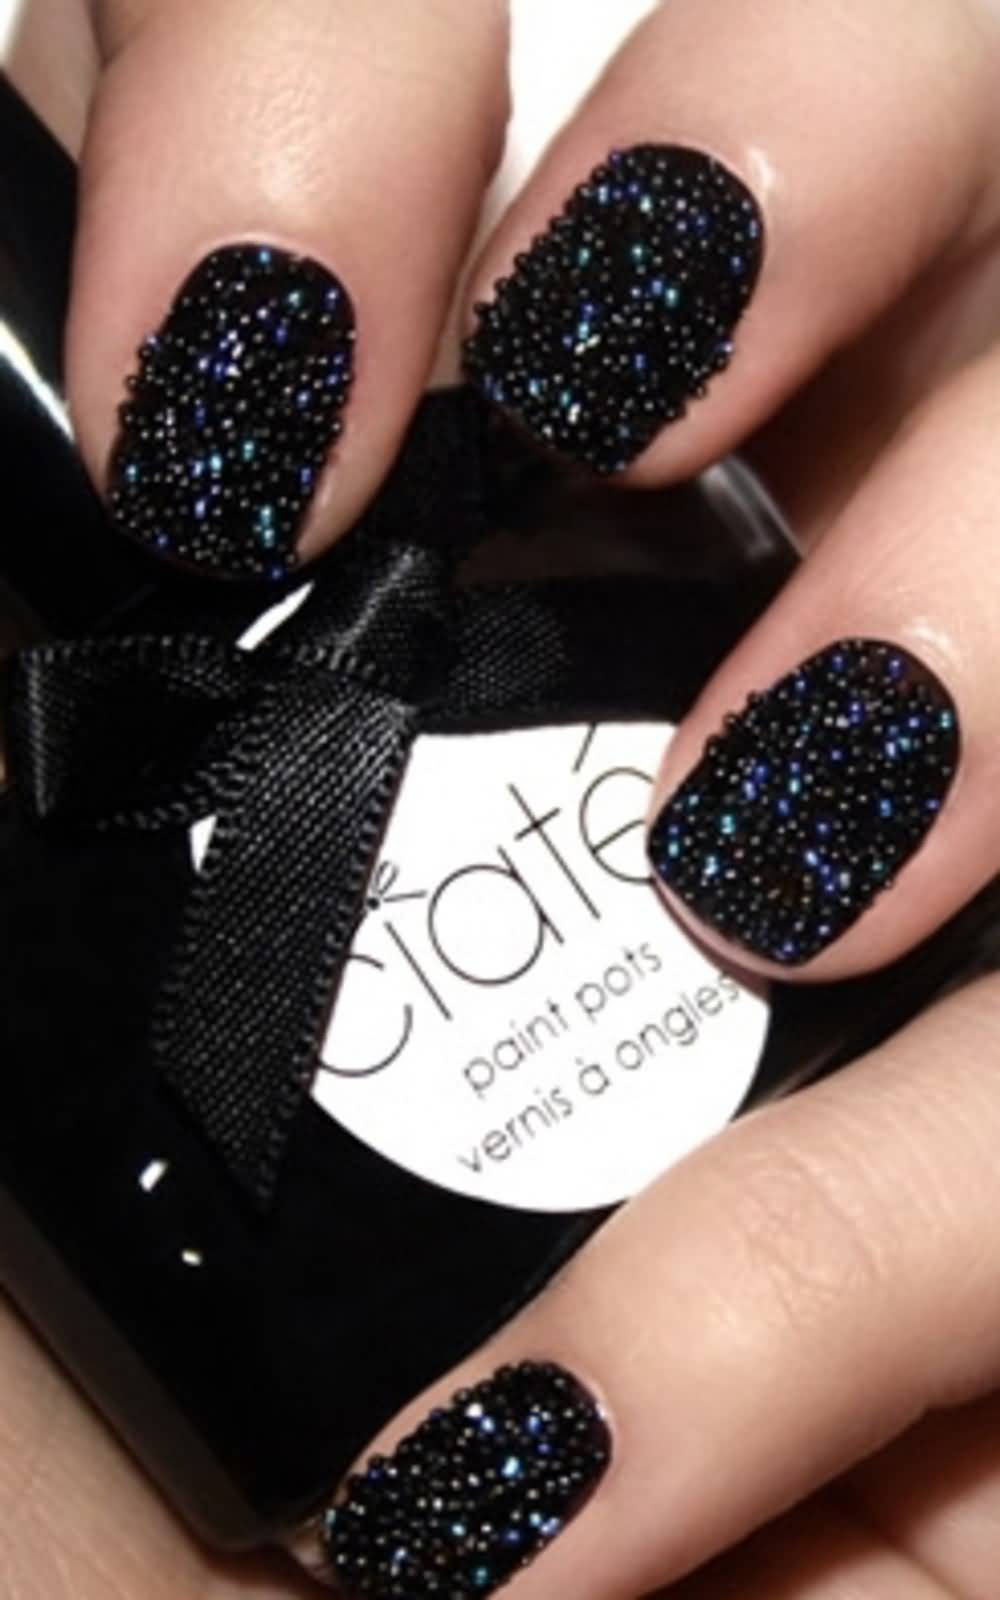 caviar-nail-polish4 The Main Caviar Manicure Creative Way to Apply in 2018